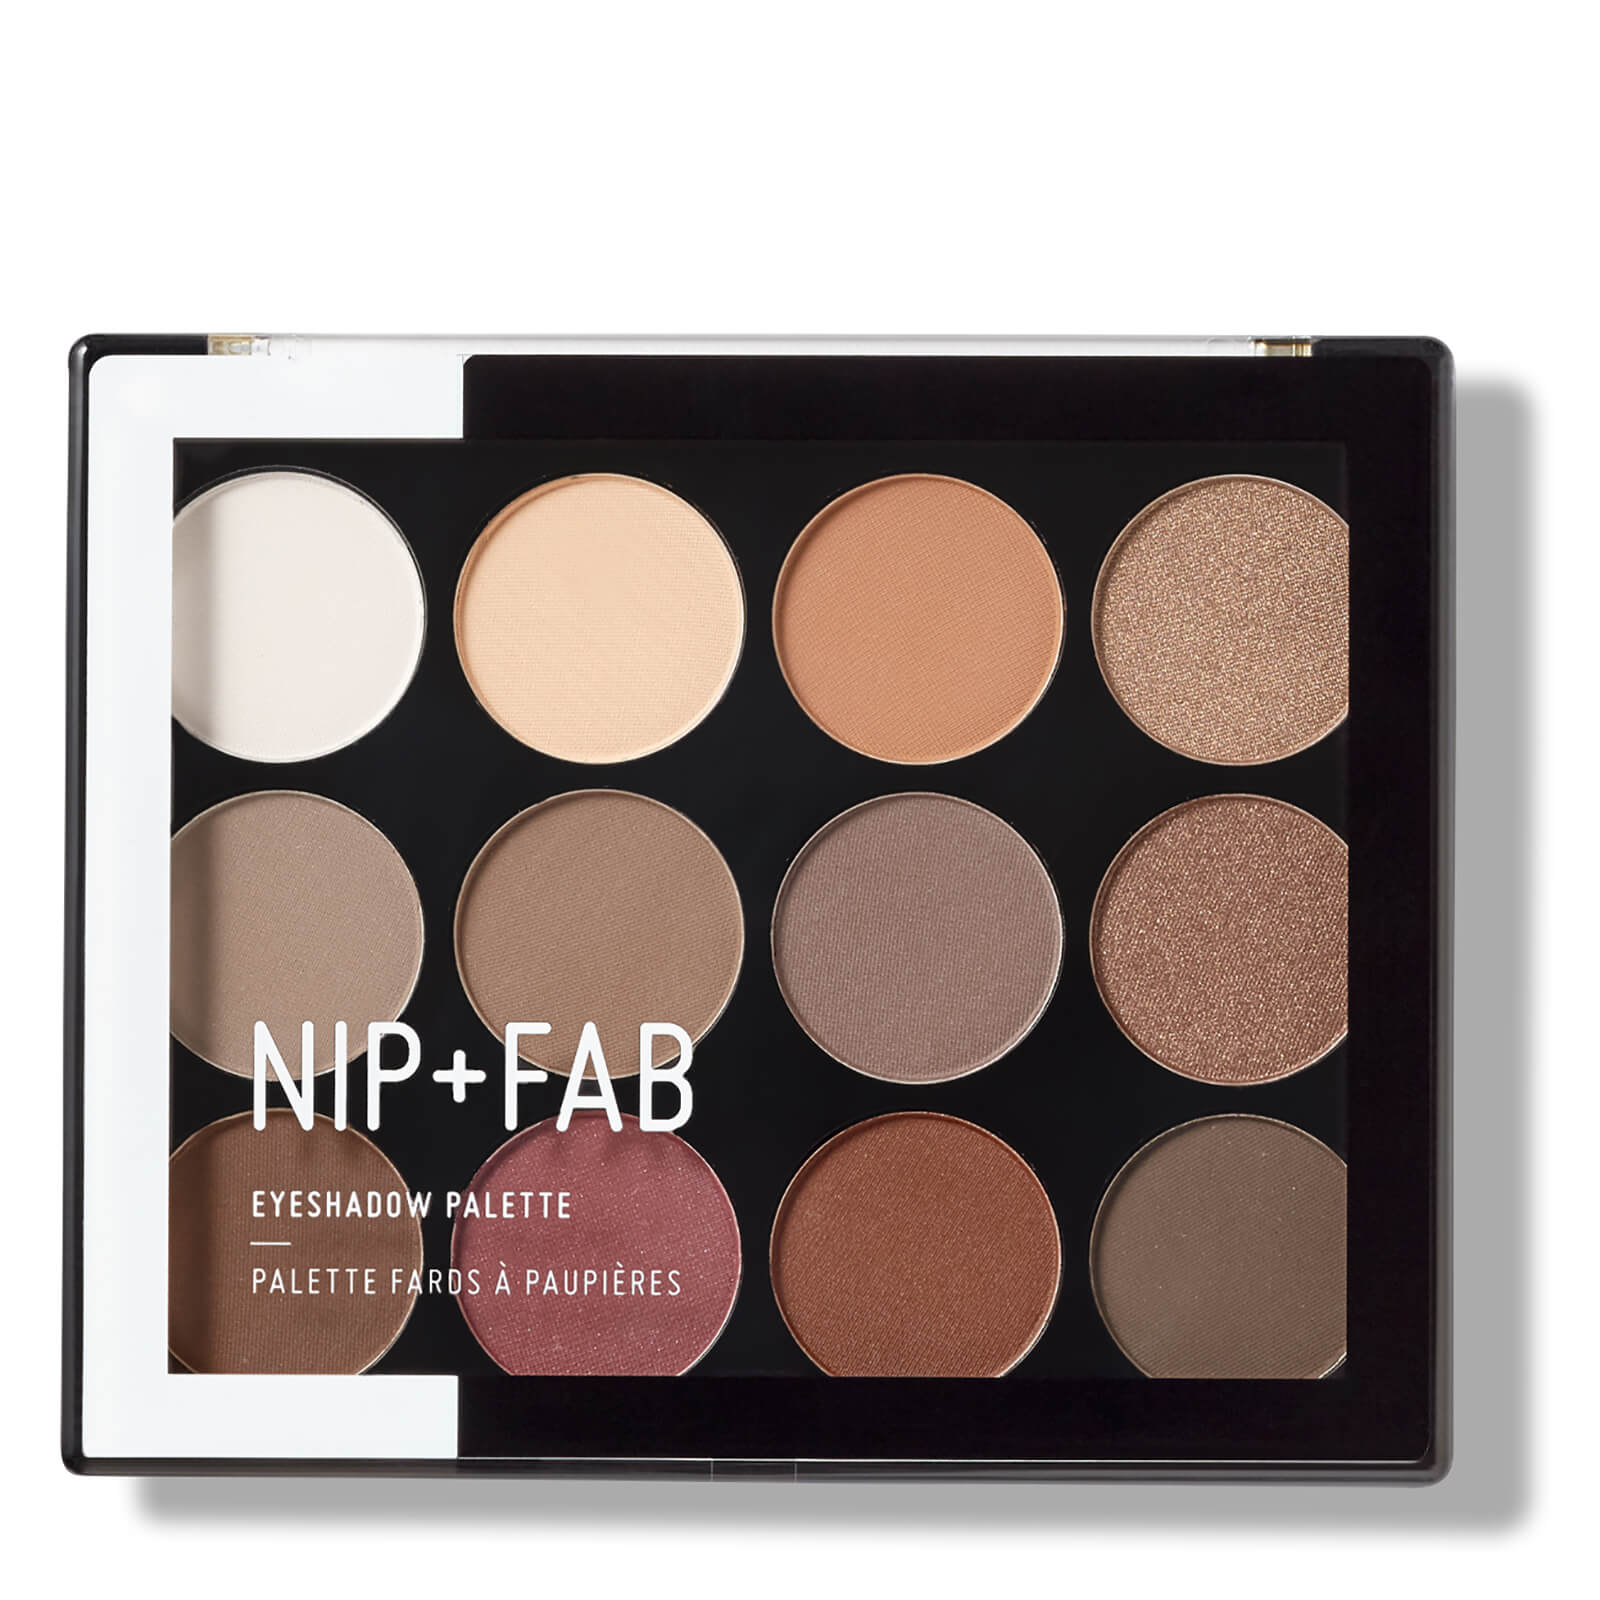 NIP+FAB Make Up Eyeshadow Palette - Sculpted 12g